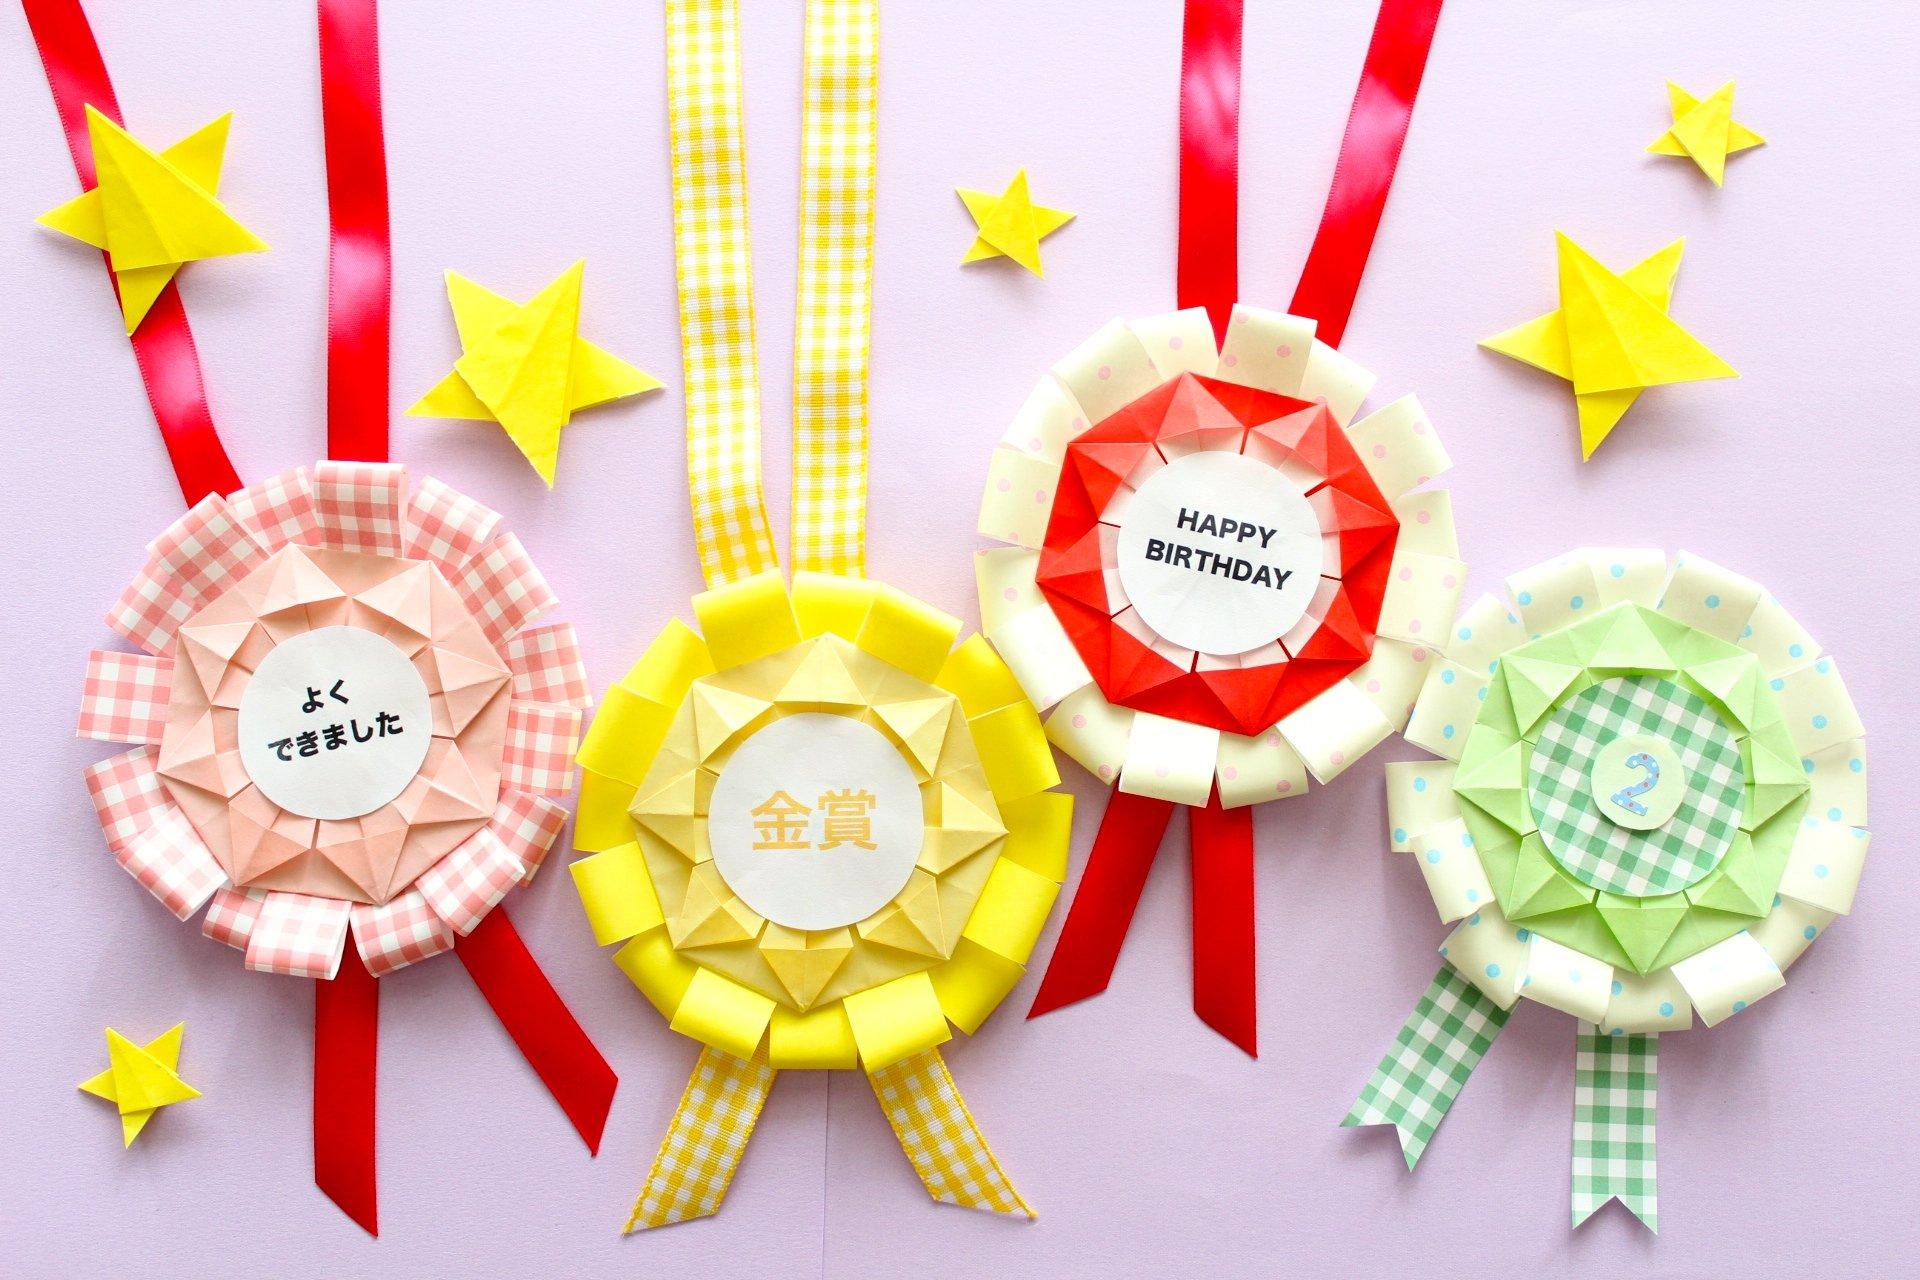 1 498.jpg?resize=1200,630 - 簡単にできる!折り紙のメダルの作り方